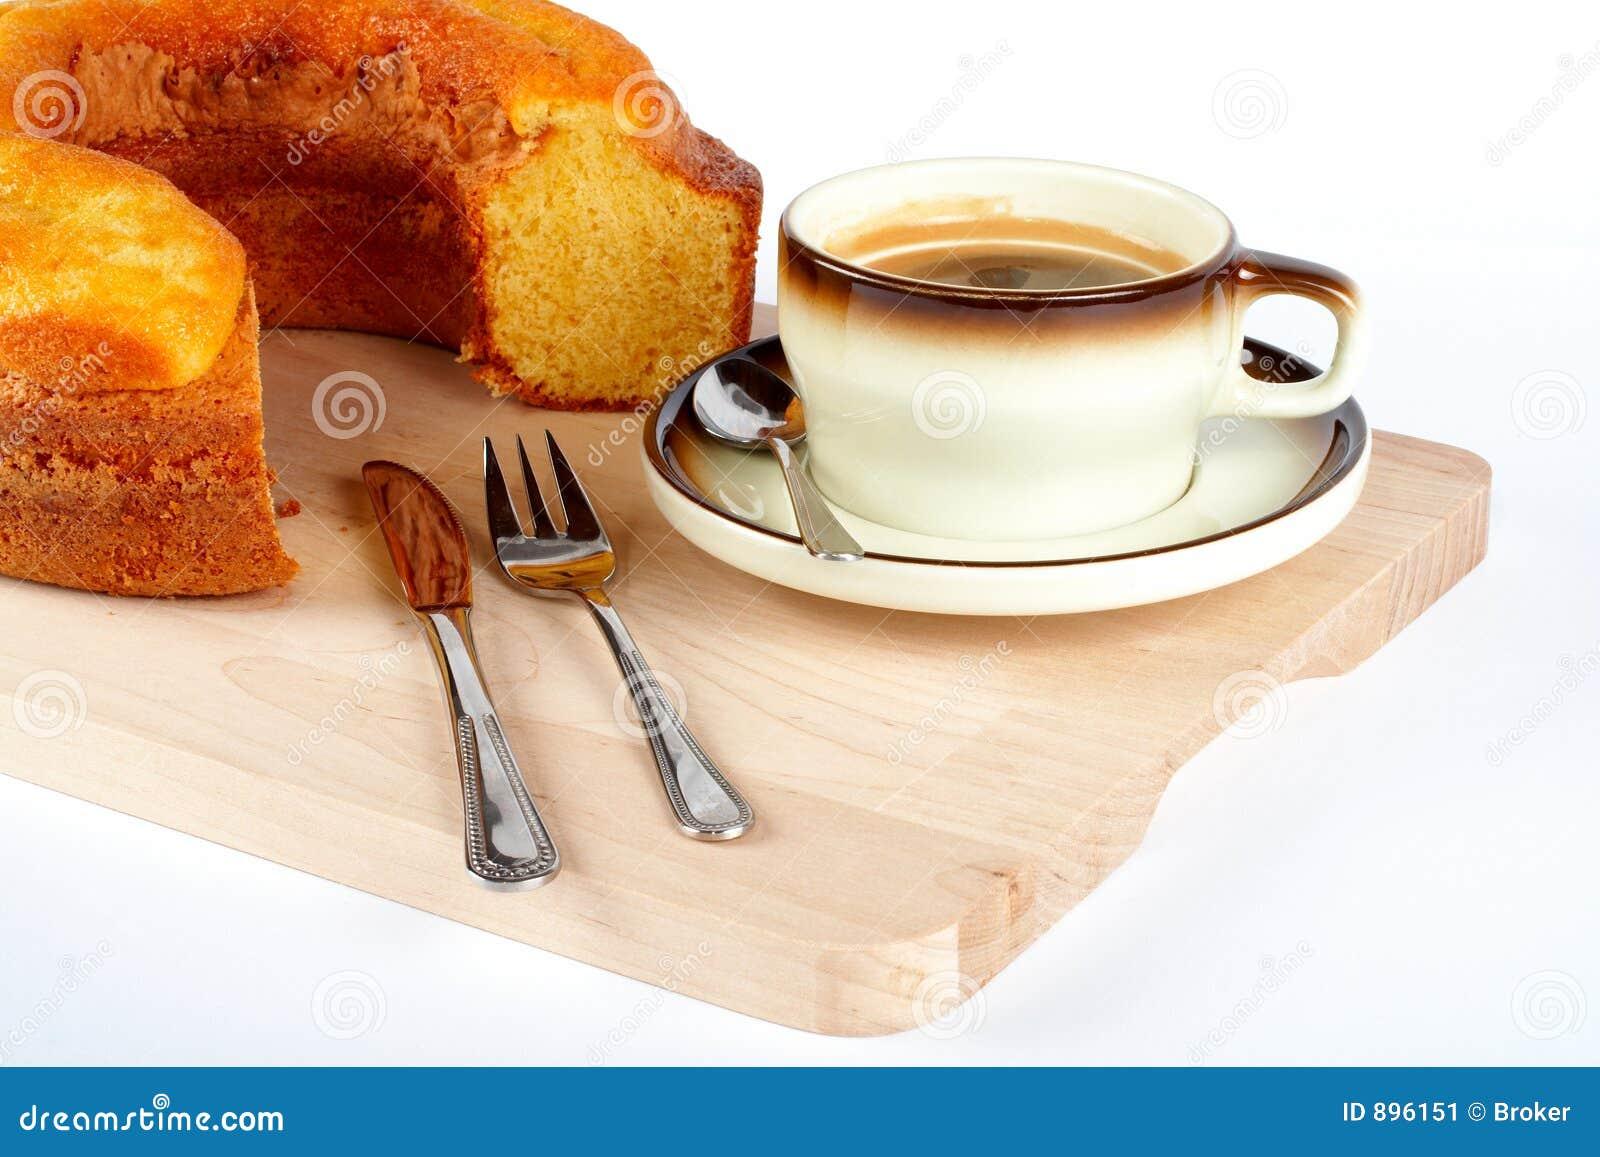 White Sugar Sponge Cake Calories